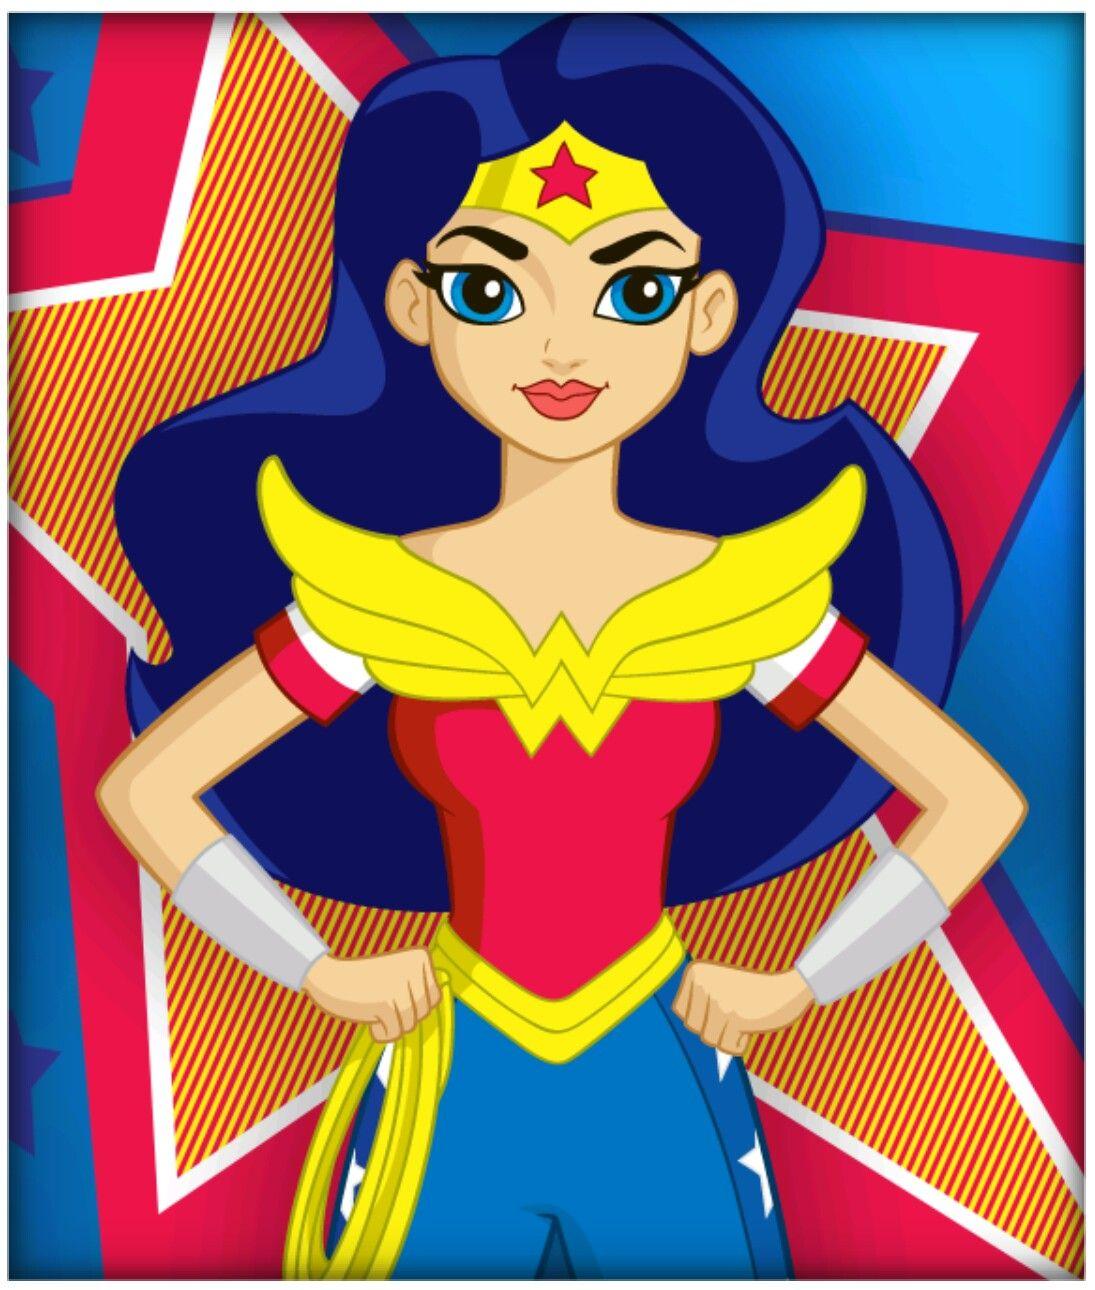 4d1b2530752a7 DC Super Hero Girls - Wonder Woman